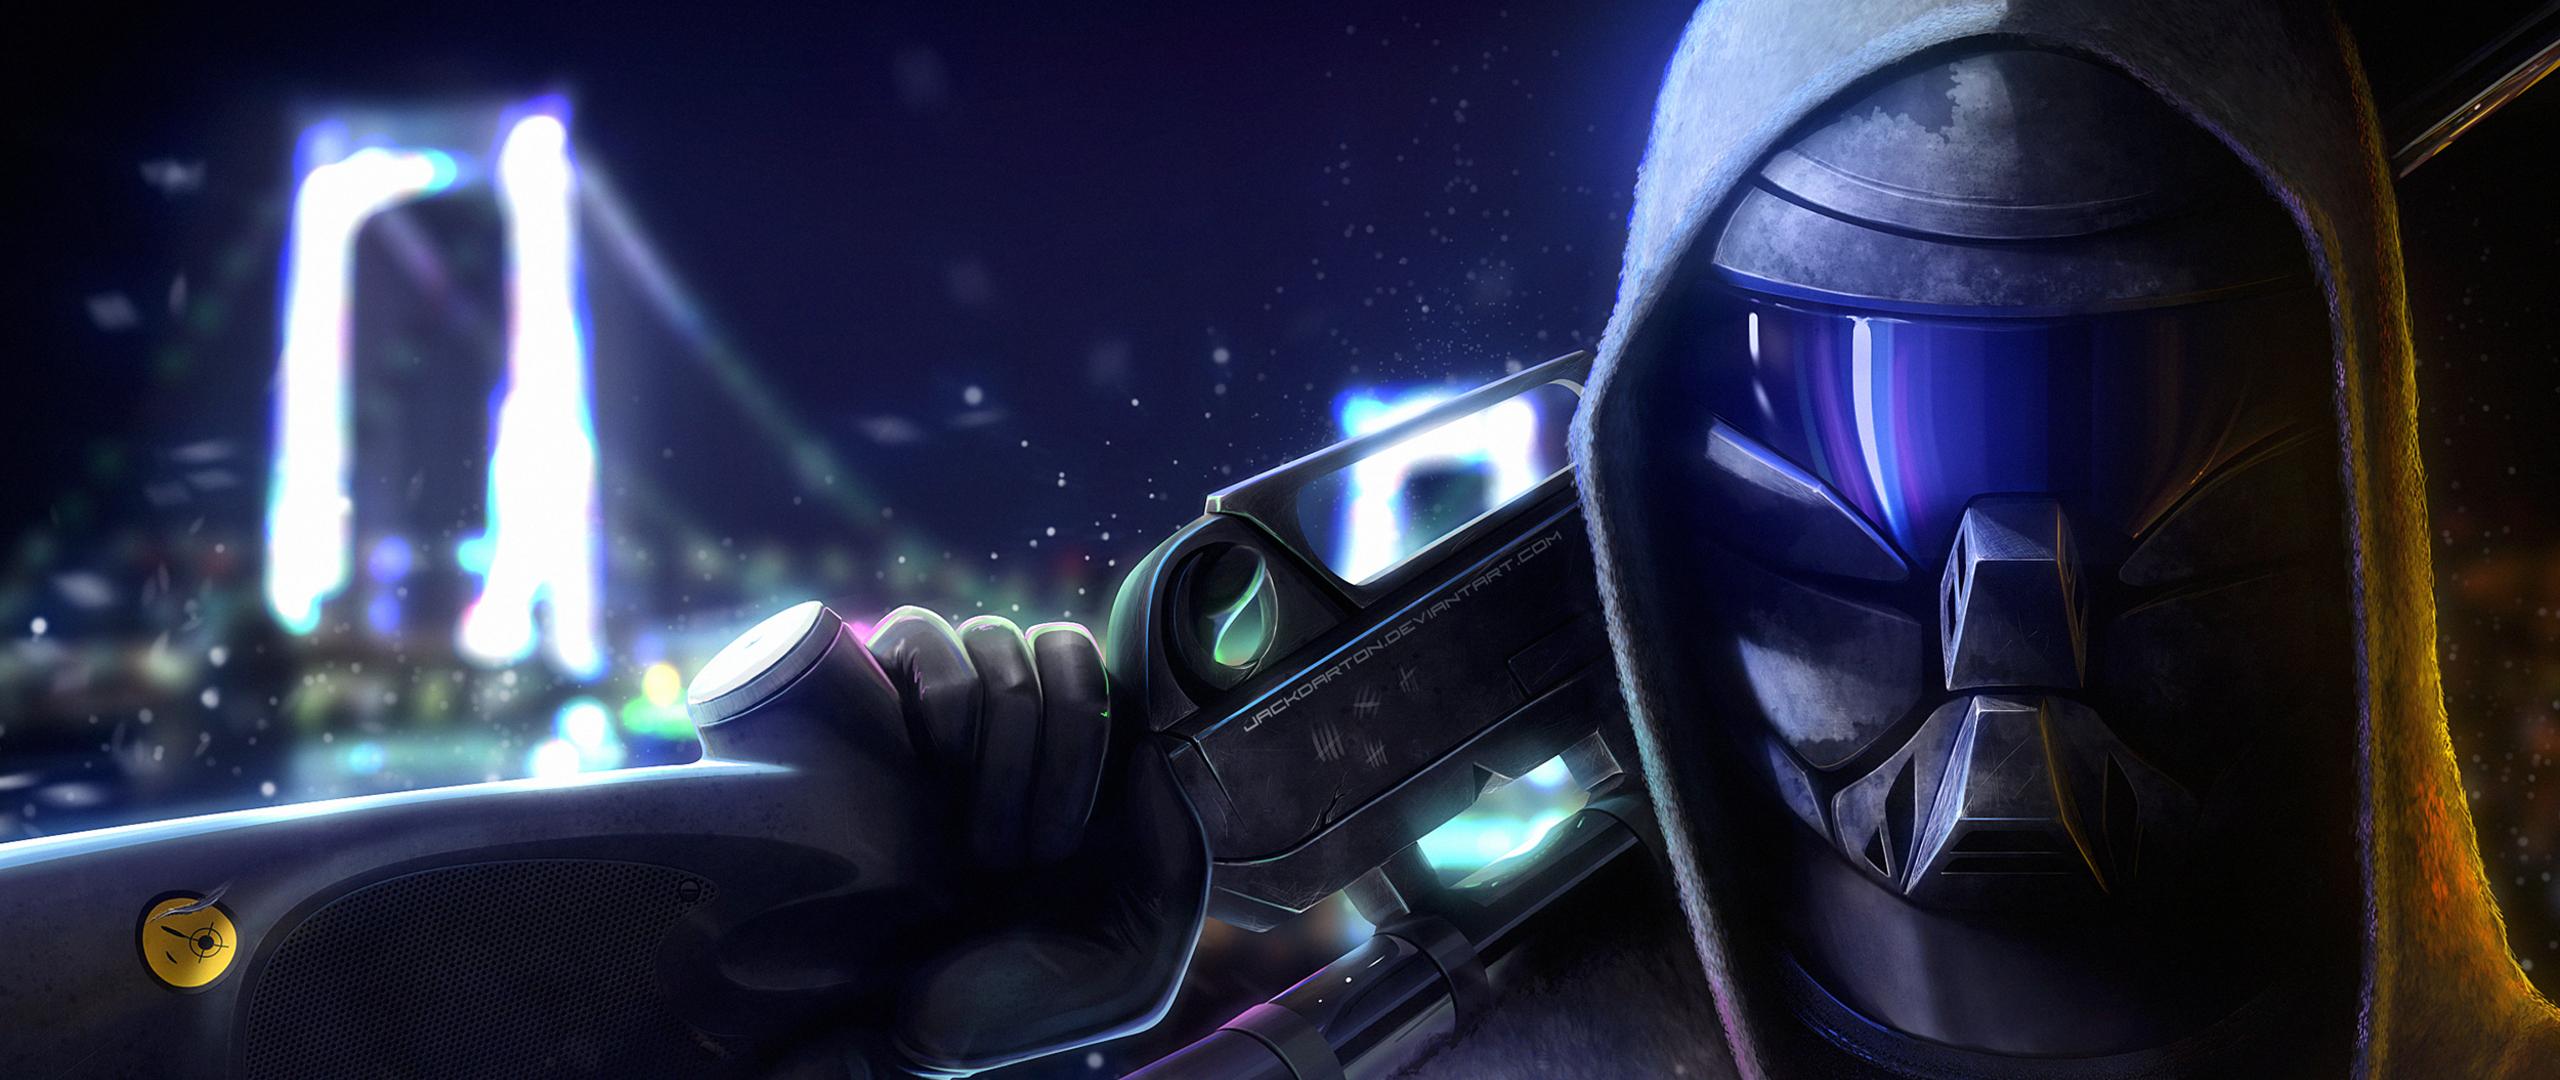 sniper-2d-art-dm.jpg